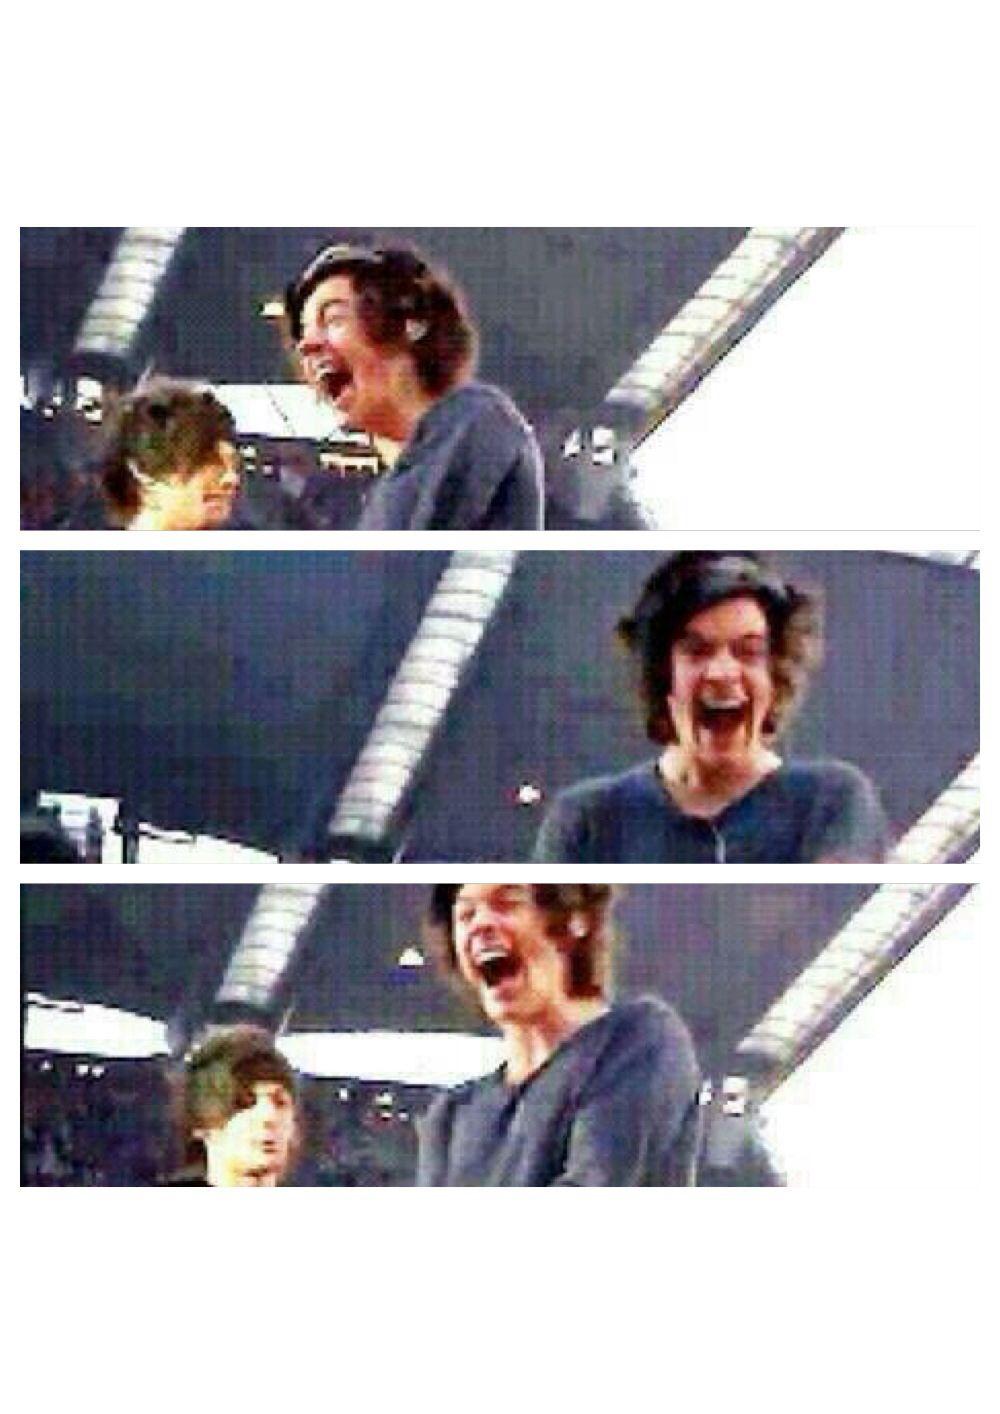 Harry's face when he saw a fan with a bushel of bananas.